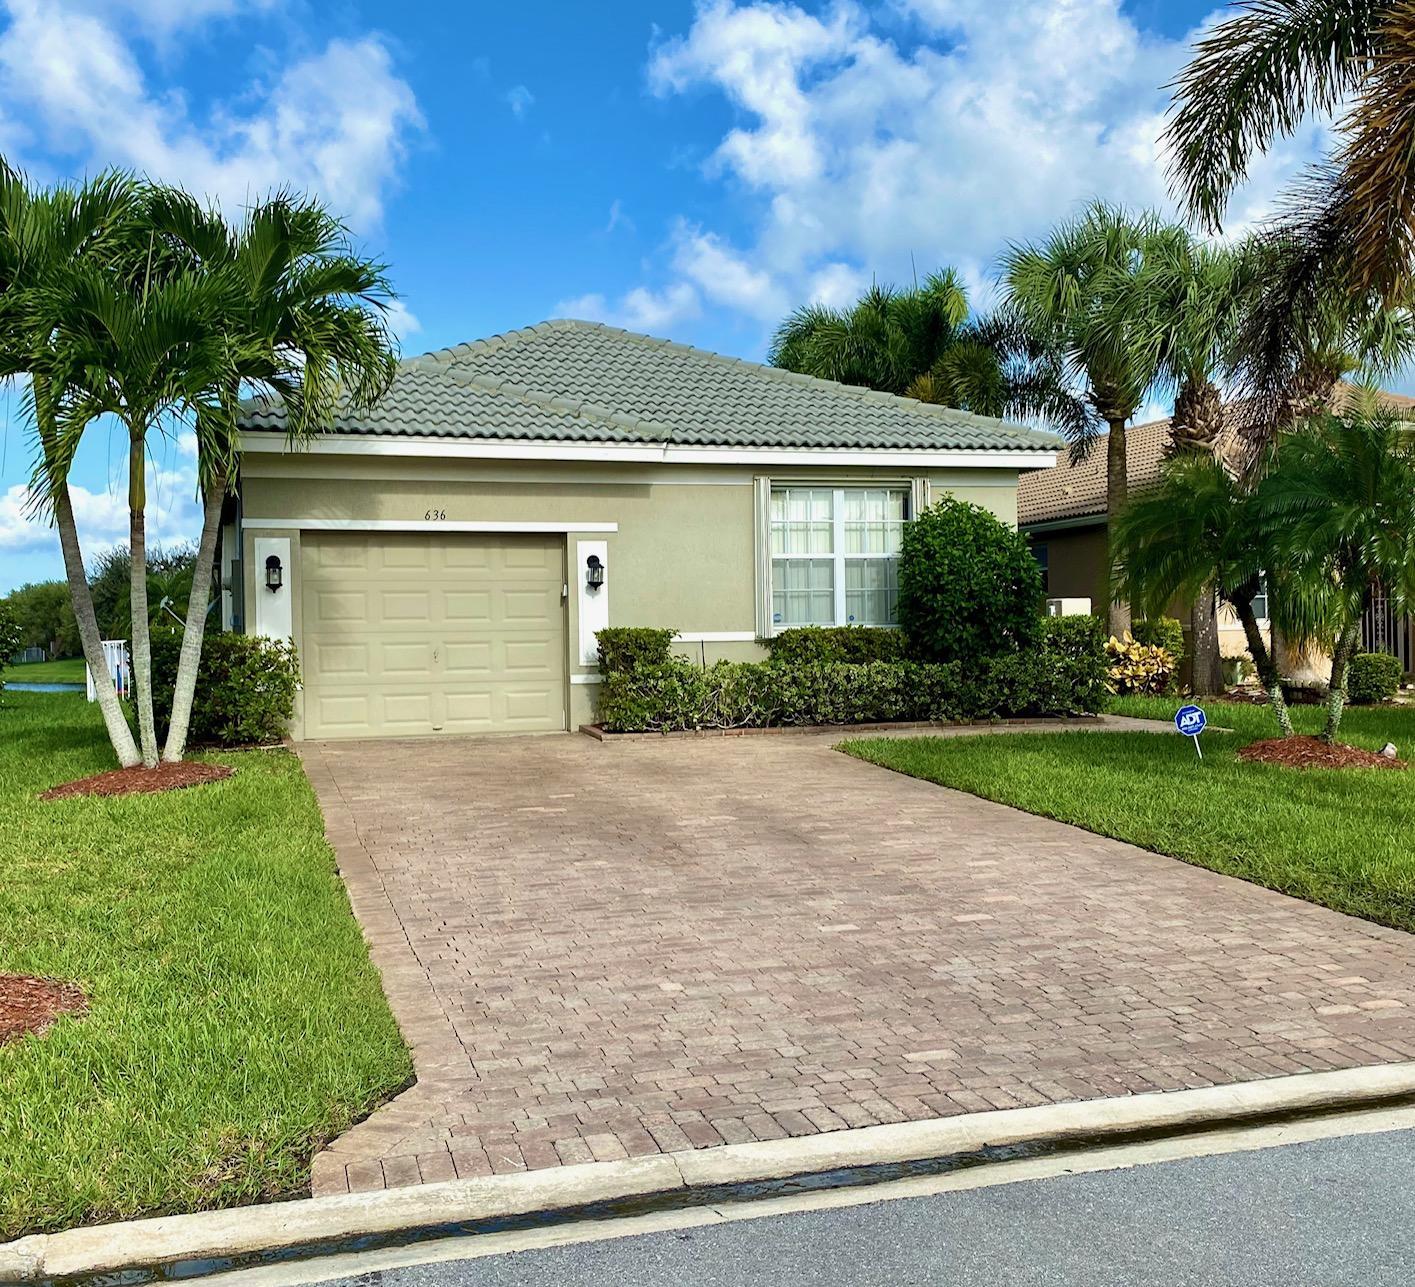 636 NW Stanford Lane - 34983 - FL - Port Saint Lucie